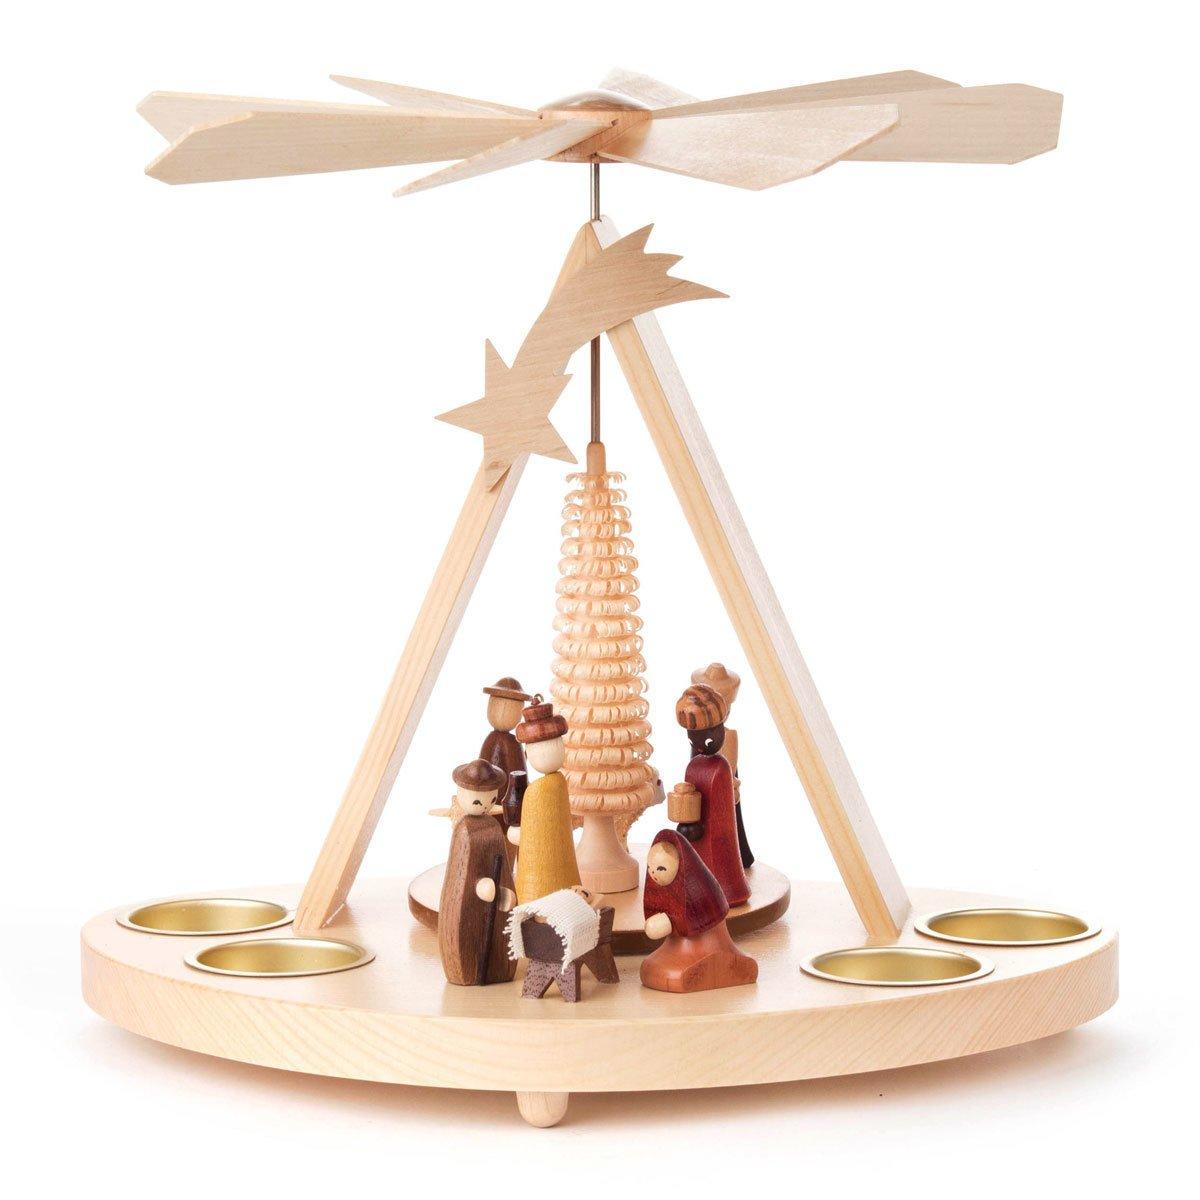 Nativity Tea Light German Pyramid - 9 3/4 Inches Tall - Christmas Carousel by Dregeno (Image #1)